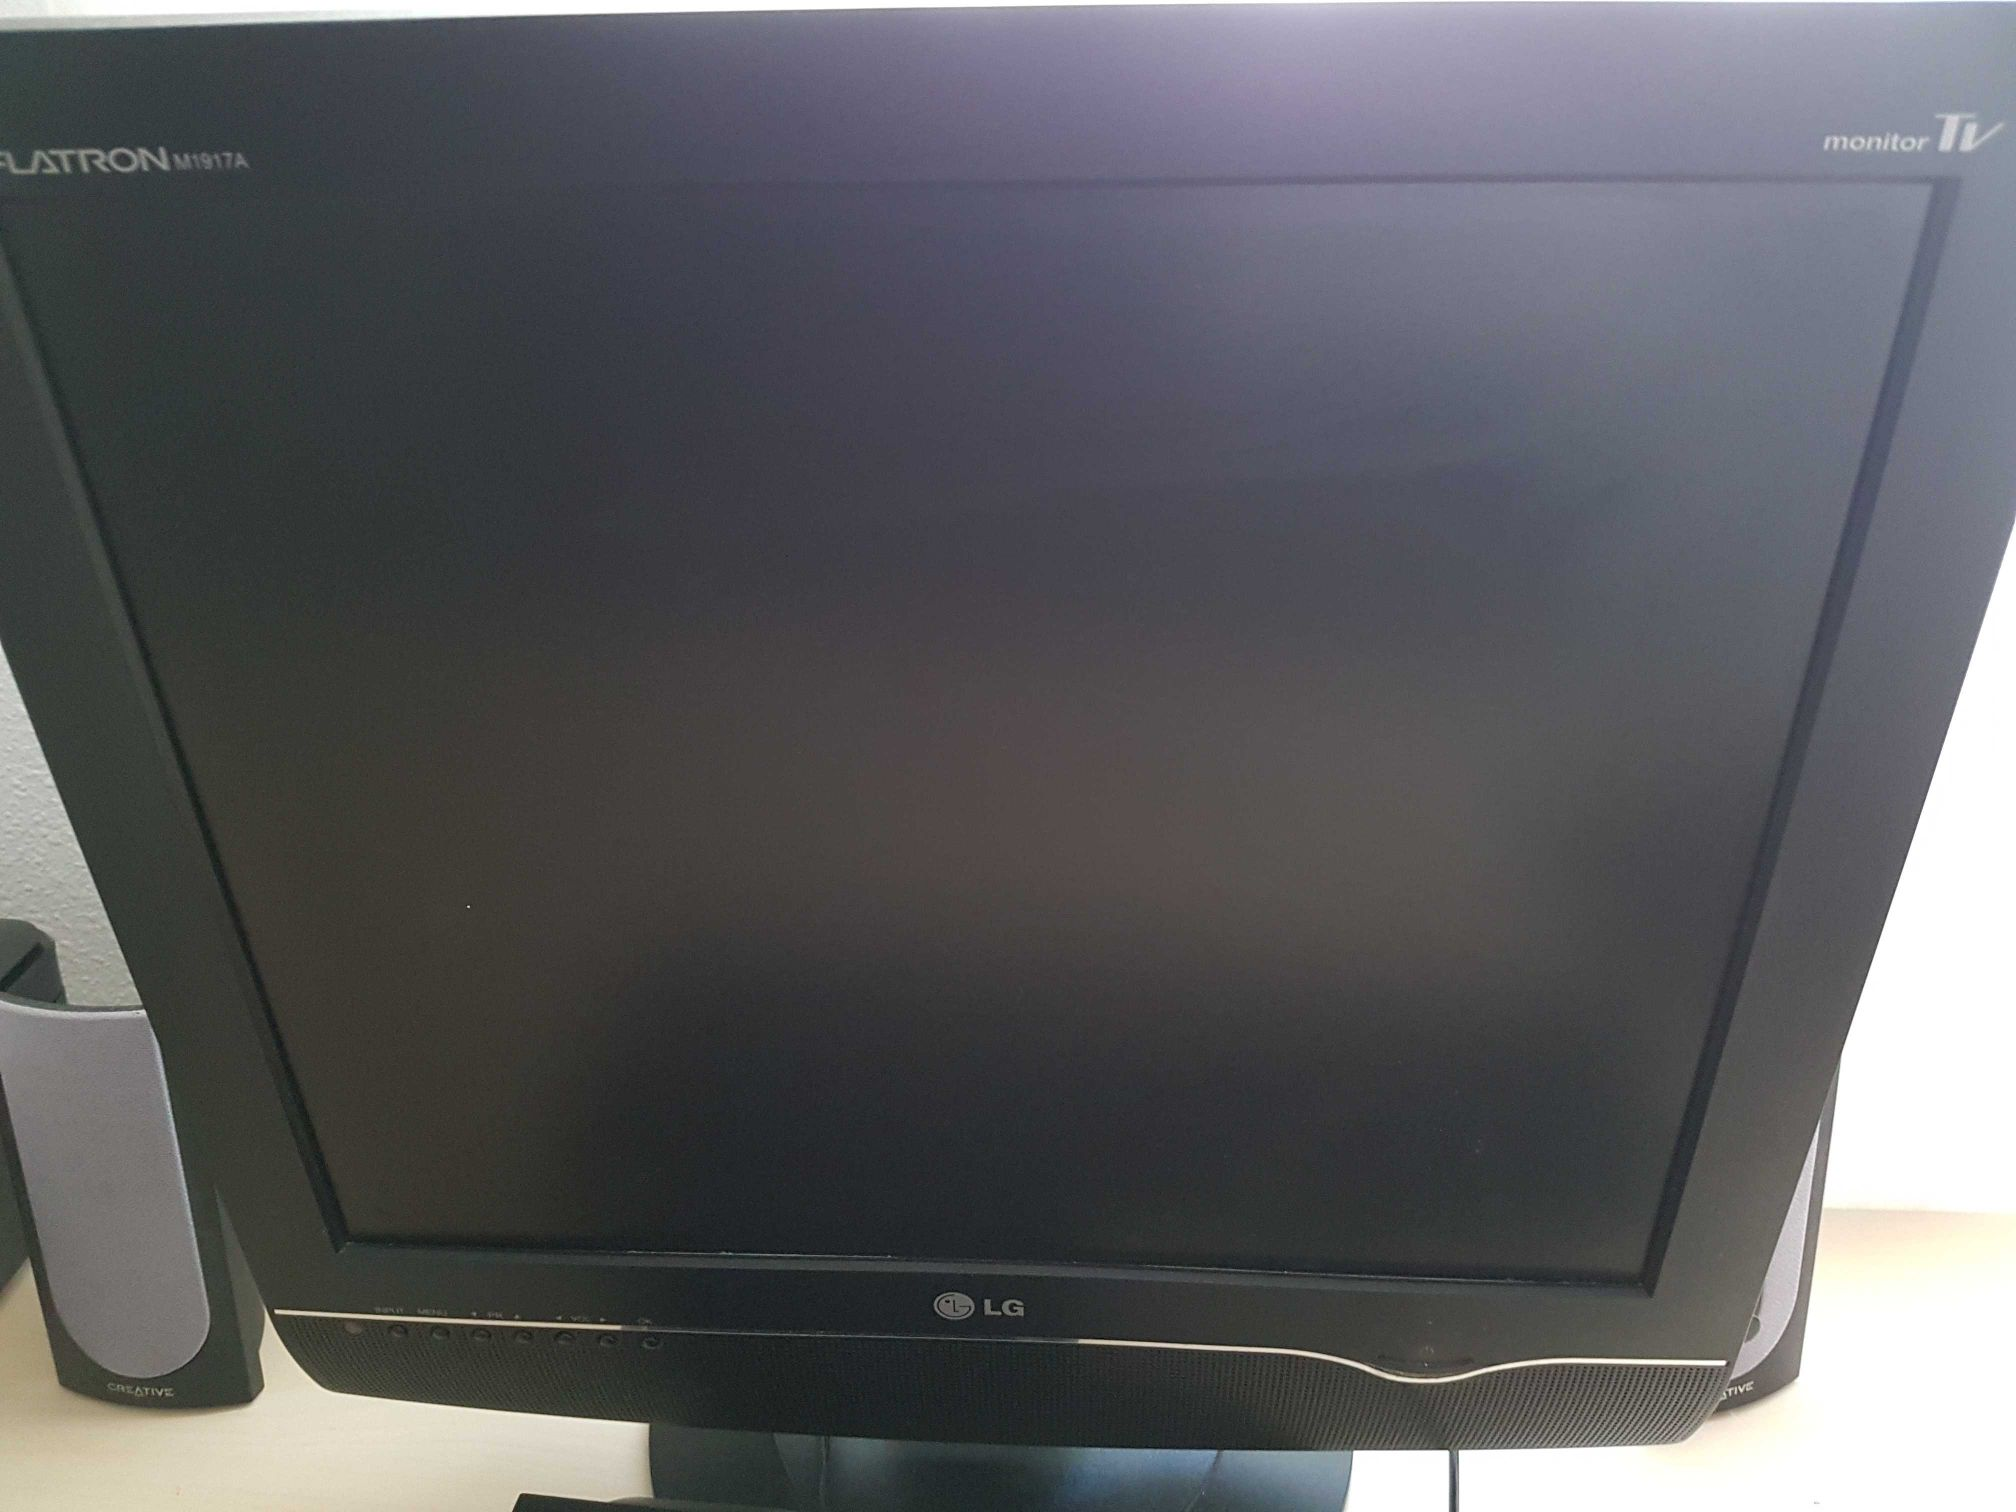 "Tasacion monitor lg tv 19"""